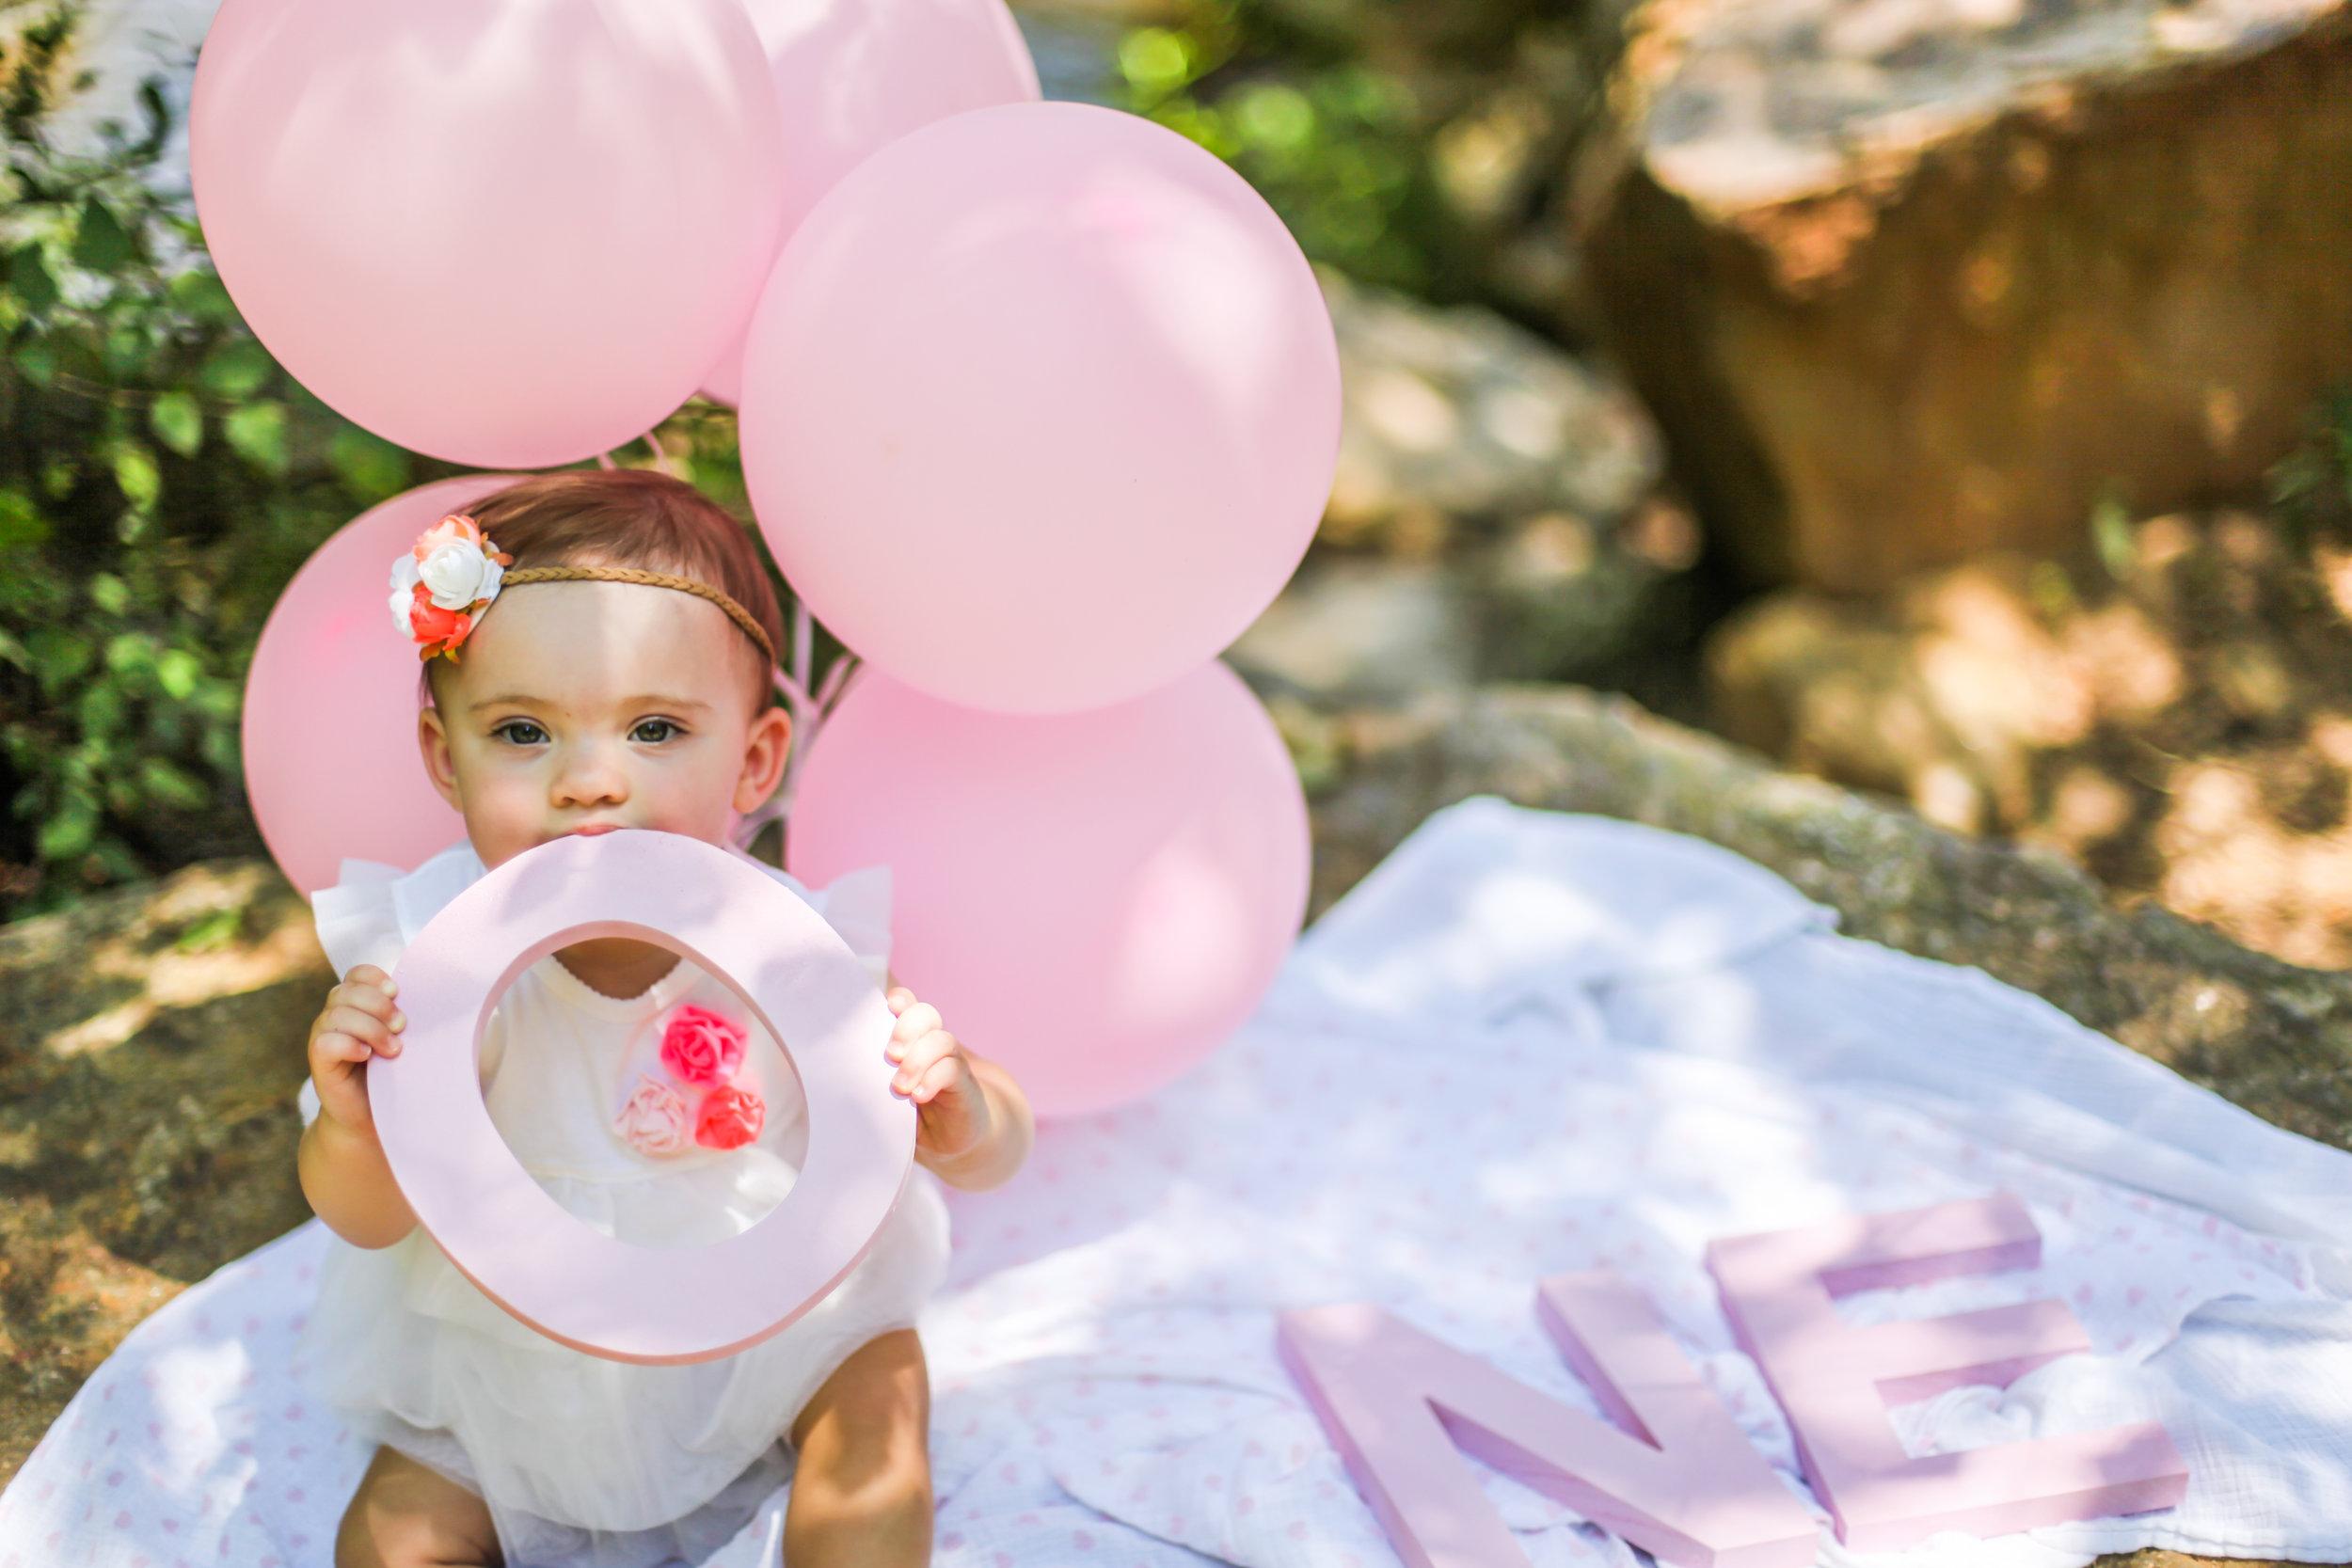 woodstock baby photography angela elliott-84.jpg